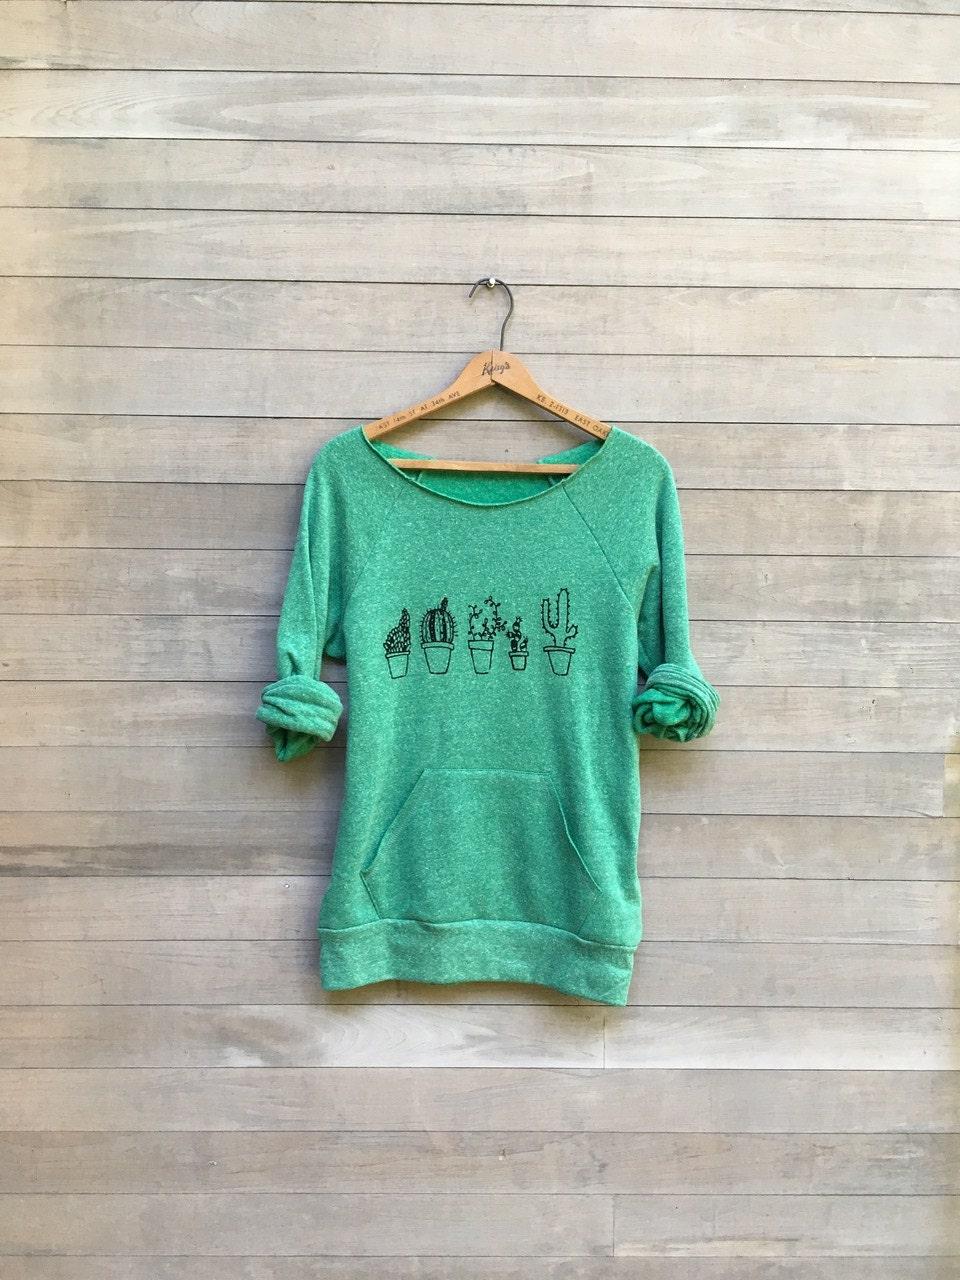 2c02bf190d776 not so needy Cactus Sweatshirt, Cactus Shirt, Plant Lady, Gift for Mom,  Plant Mom, Yoga Top, Green Sweater, Gym Sweatshirt